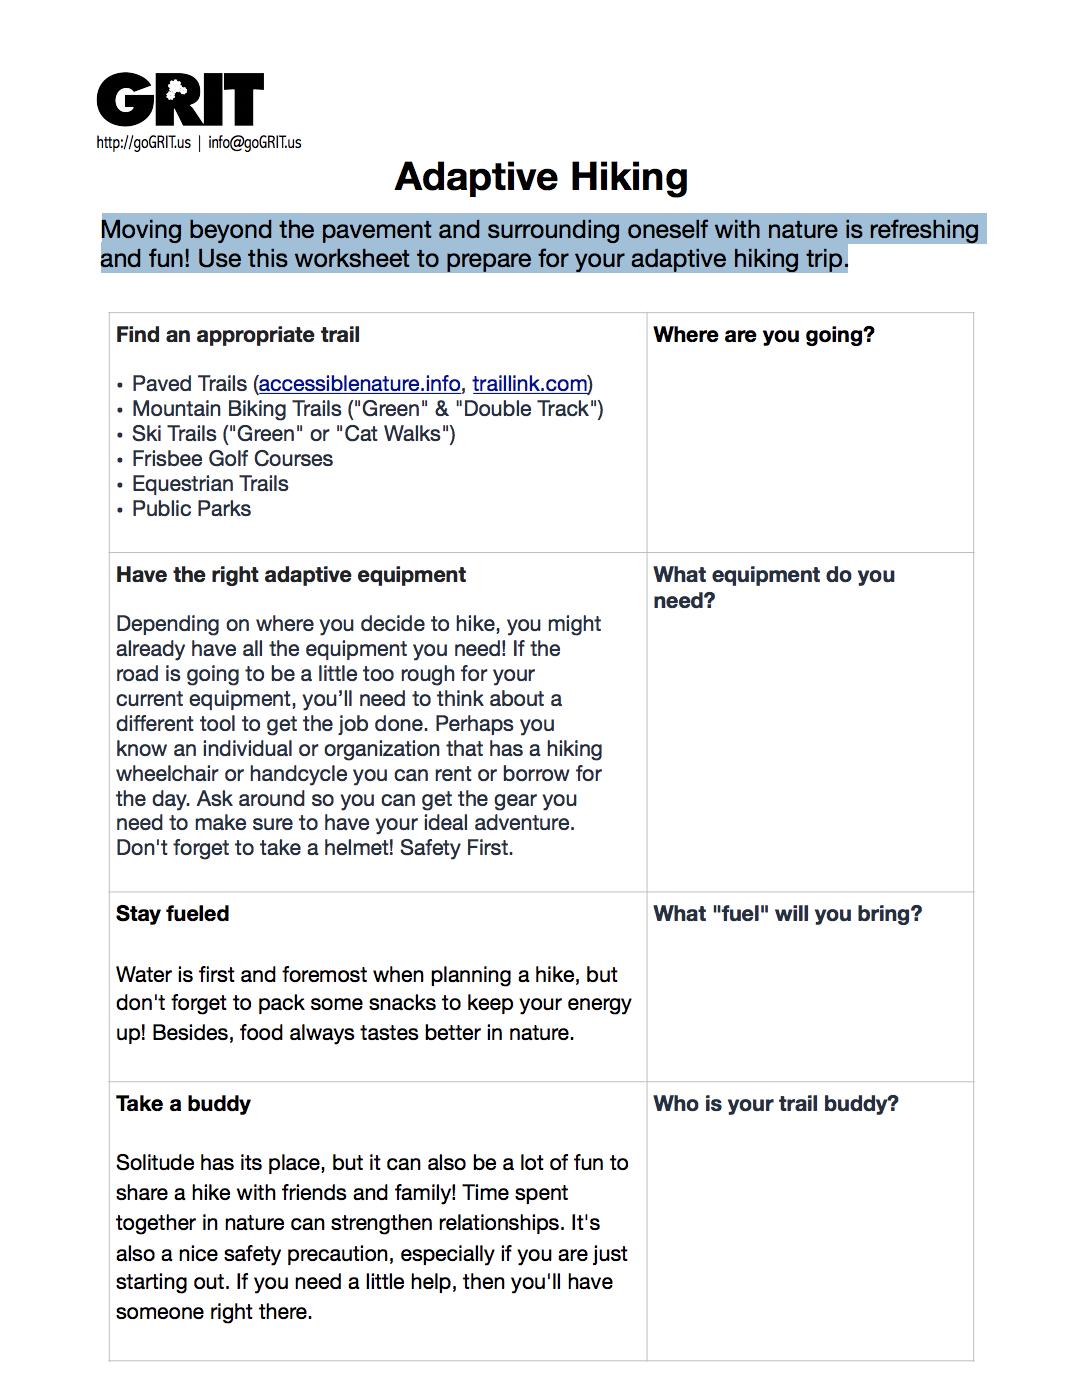 Adaptive Hiking Checklist